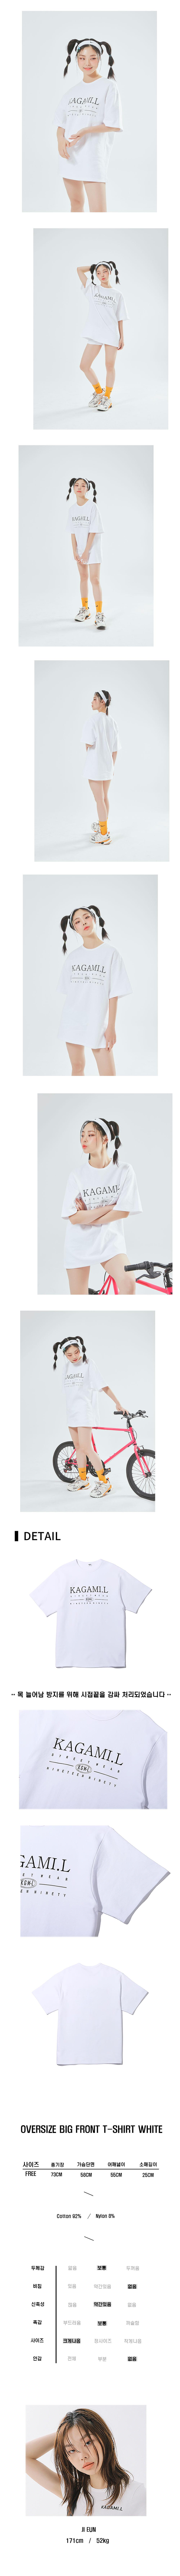 bic-front-박스티-흰색.jpg